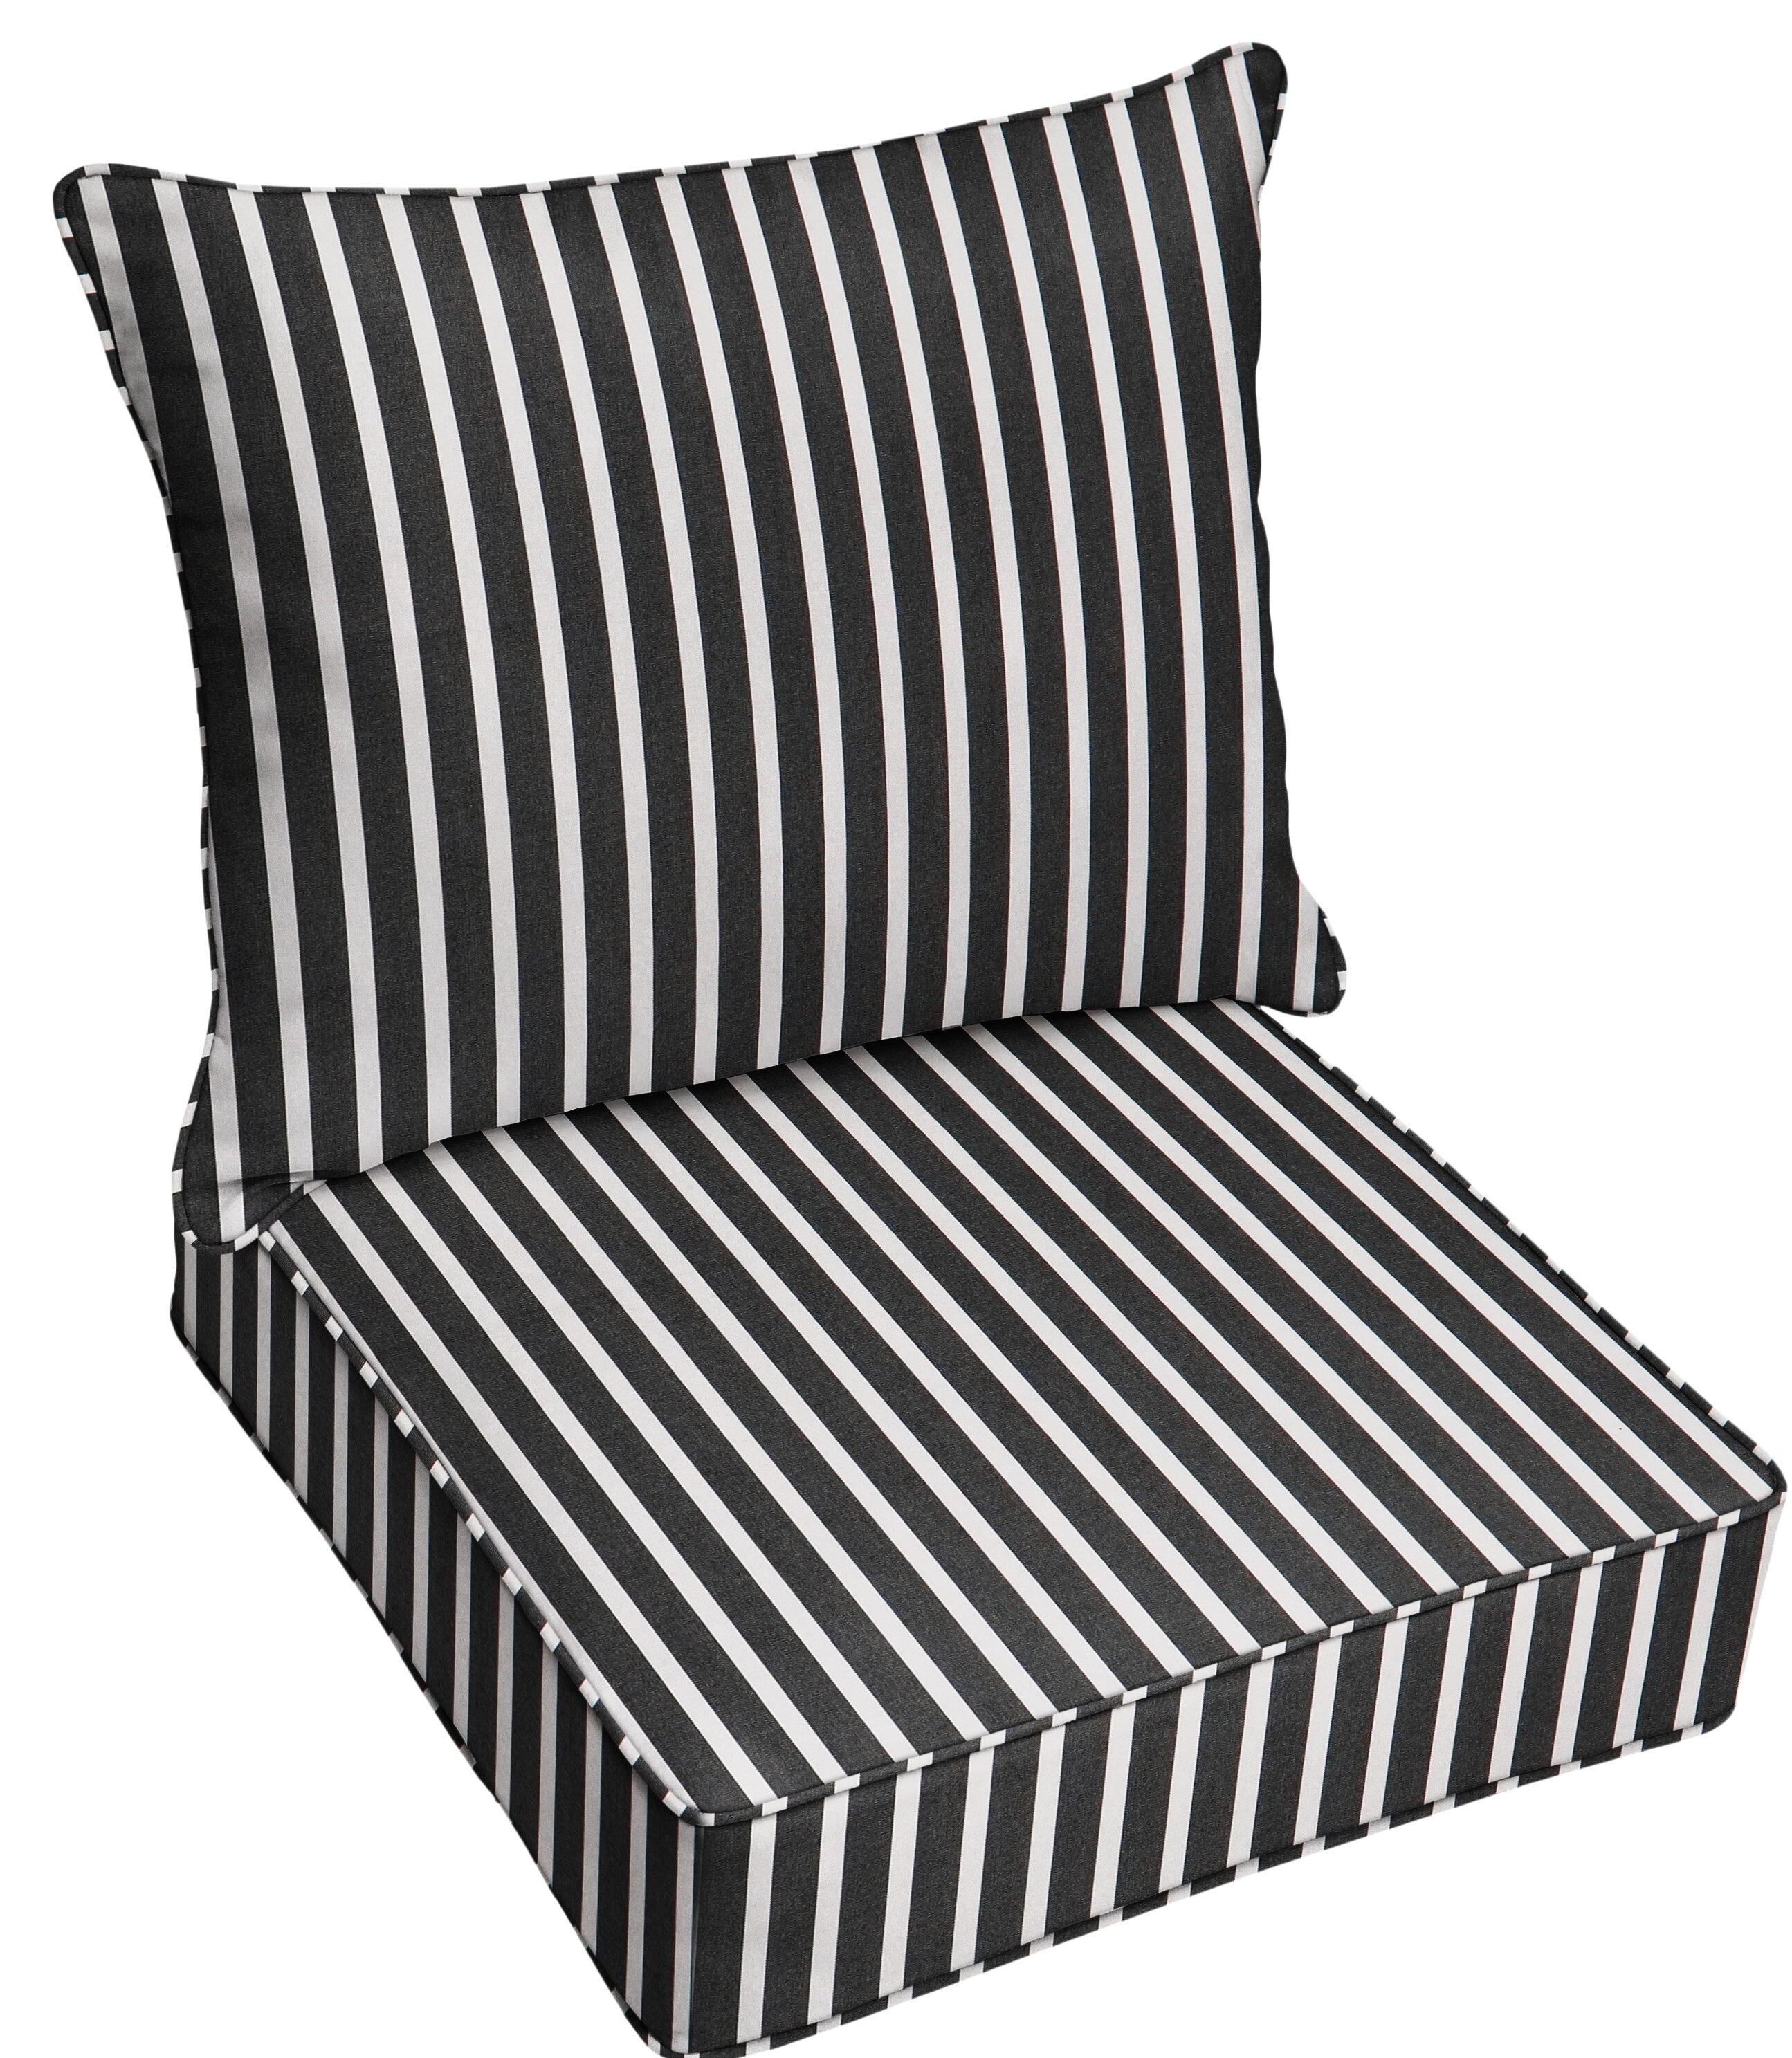 Mozaic Company 2 Piece Deep Seating Striped Indoor Outdoor Sunbrella Dining Chair Cushion Set